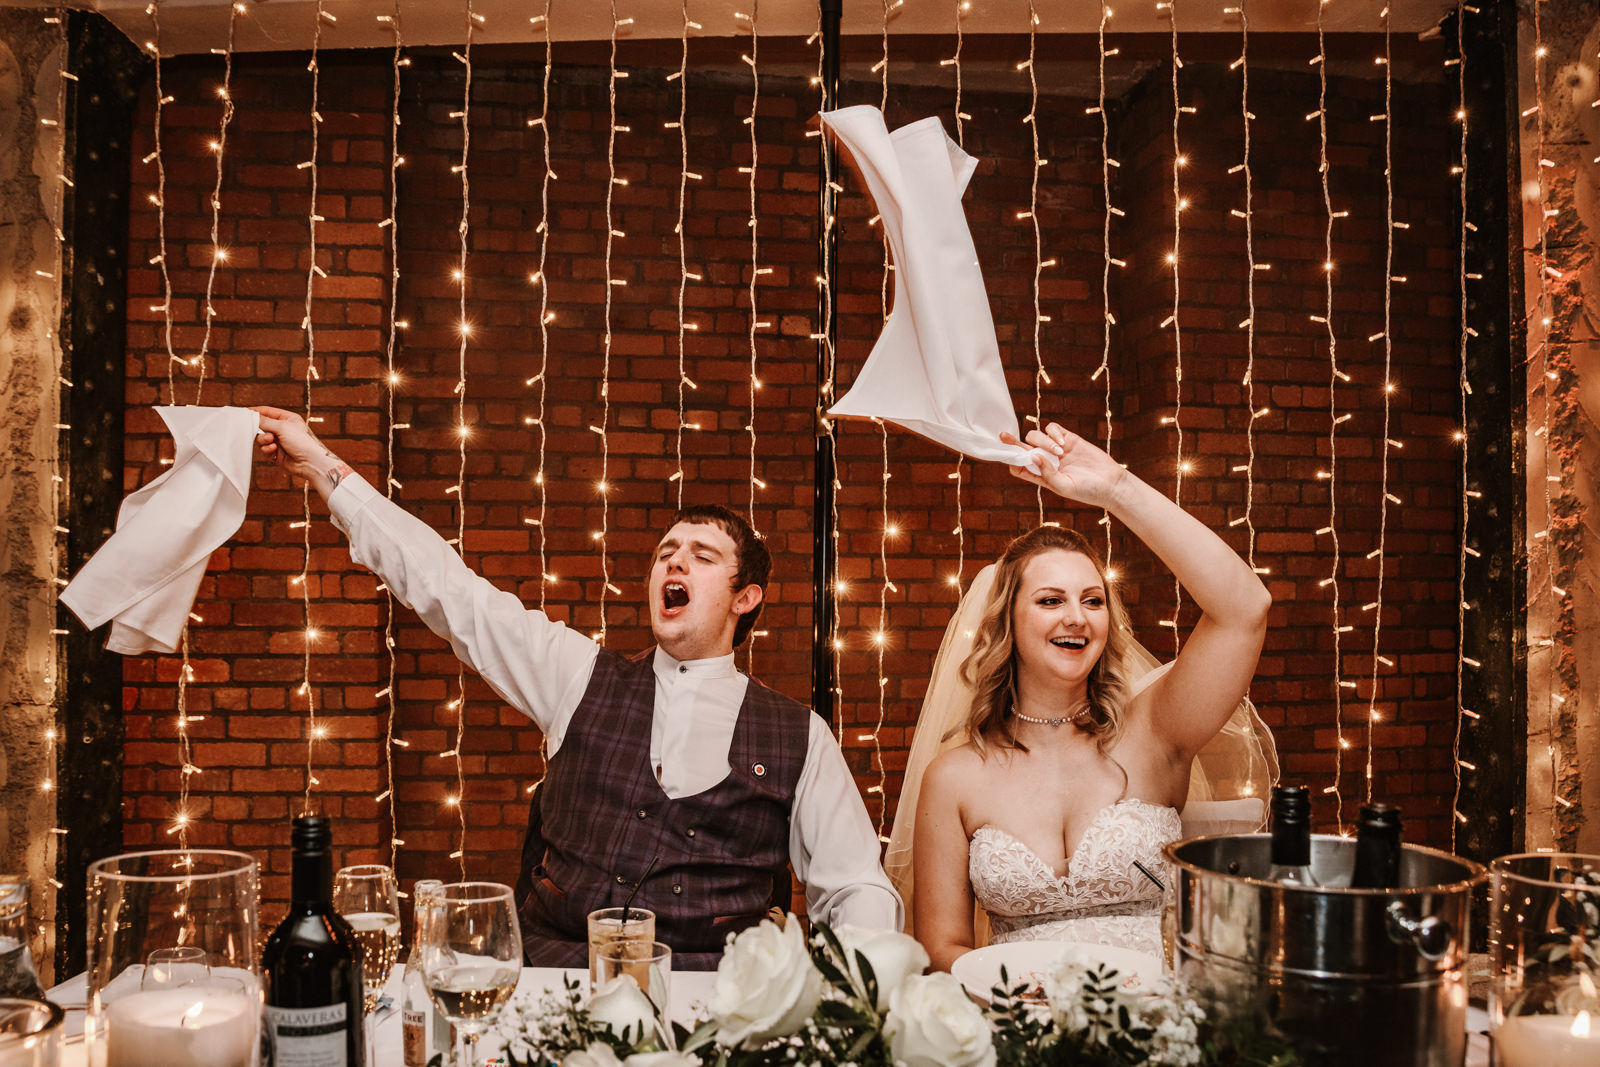 Bride and groom waving napkins at Victoria warehouse